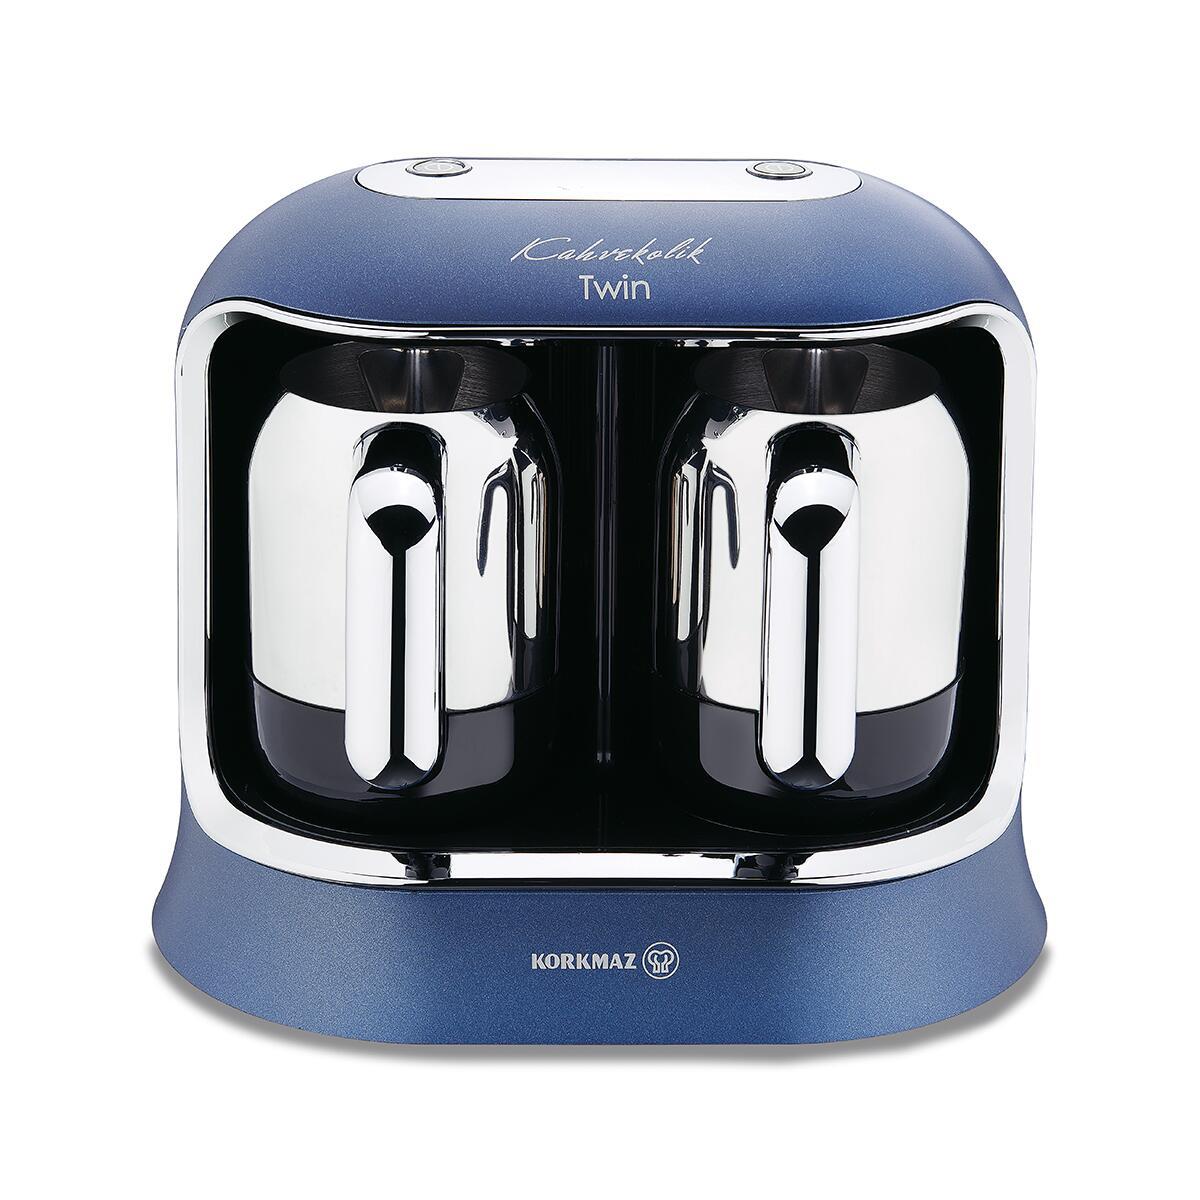 Korkmaz Kahvekolik Twin Azura/Krom Otomatik Kahve Makinesi